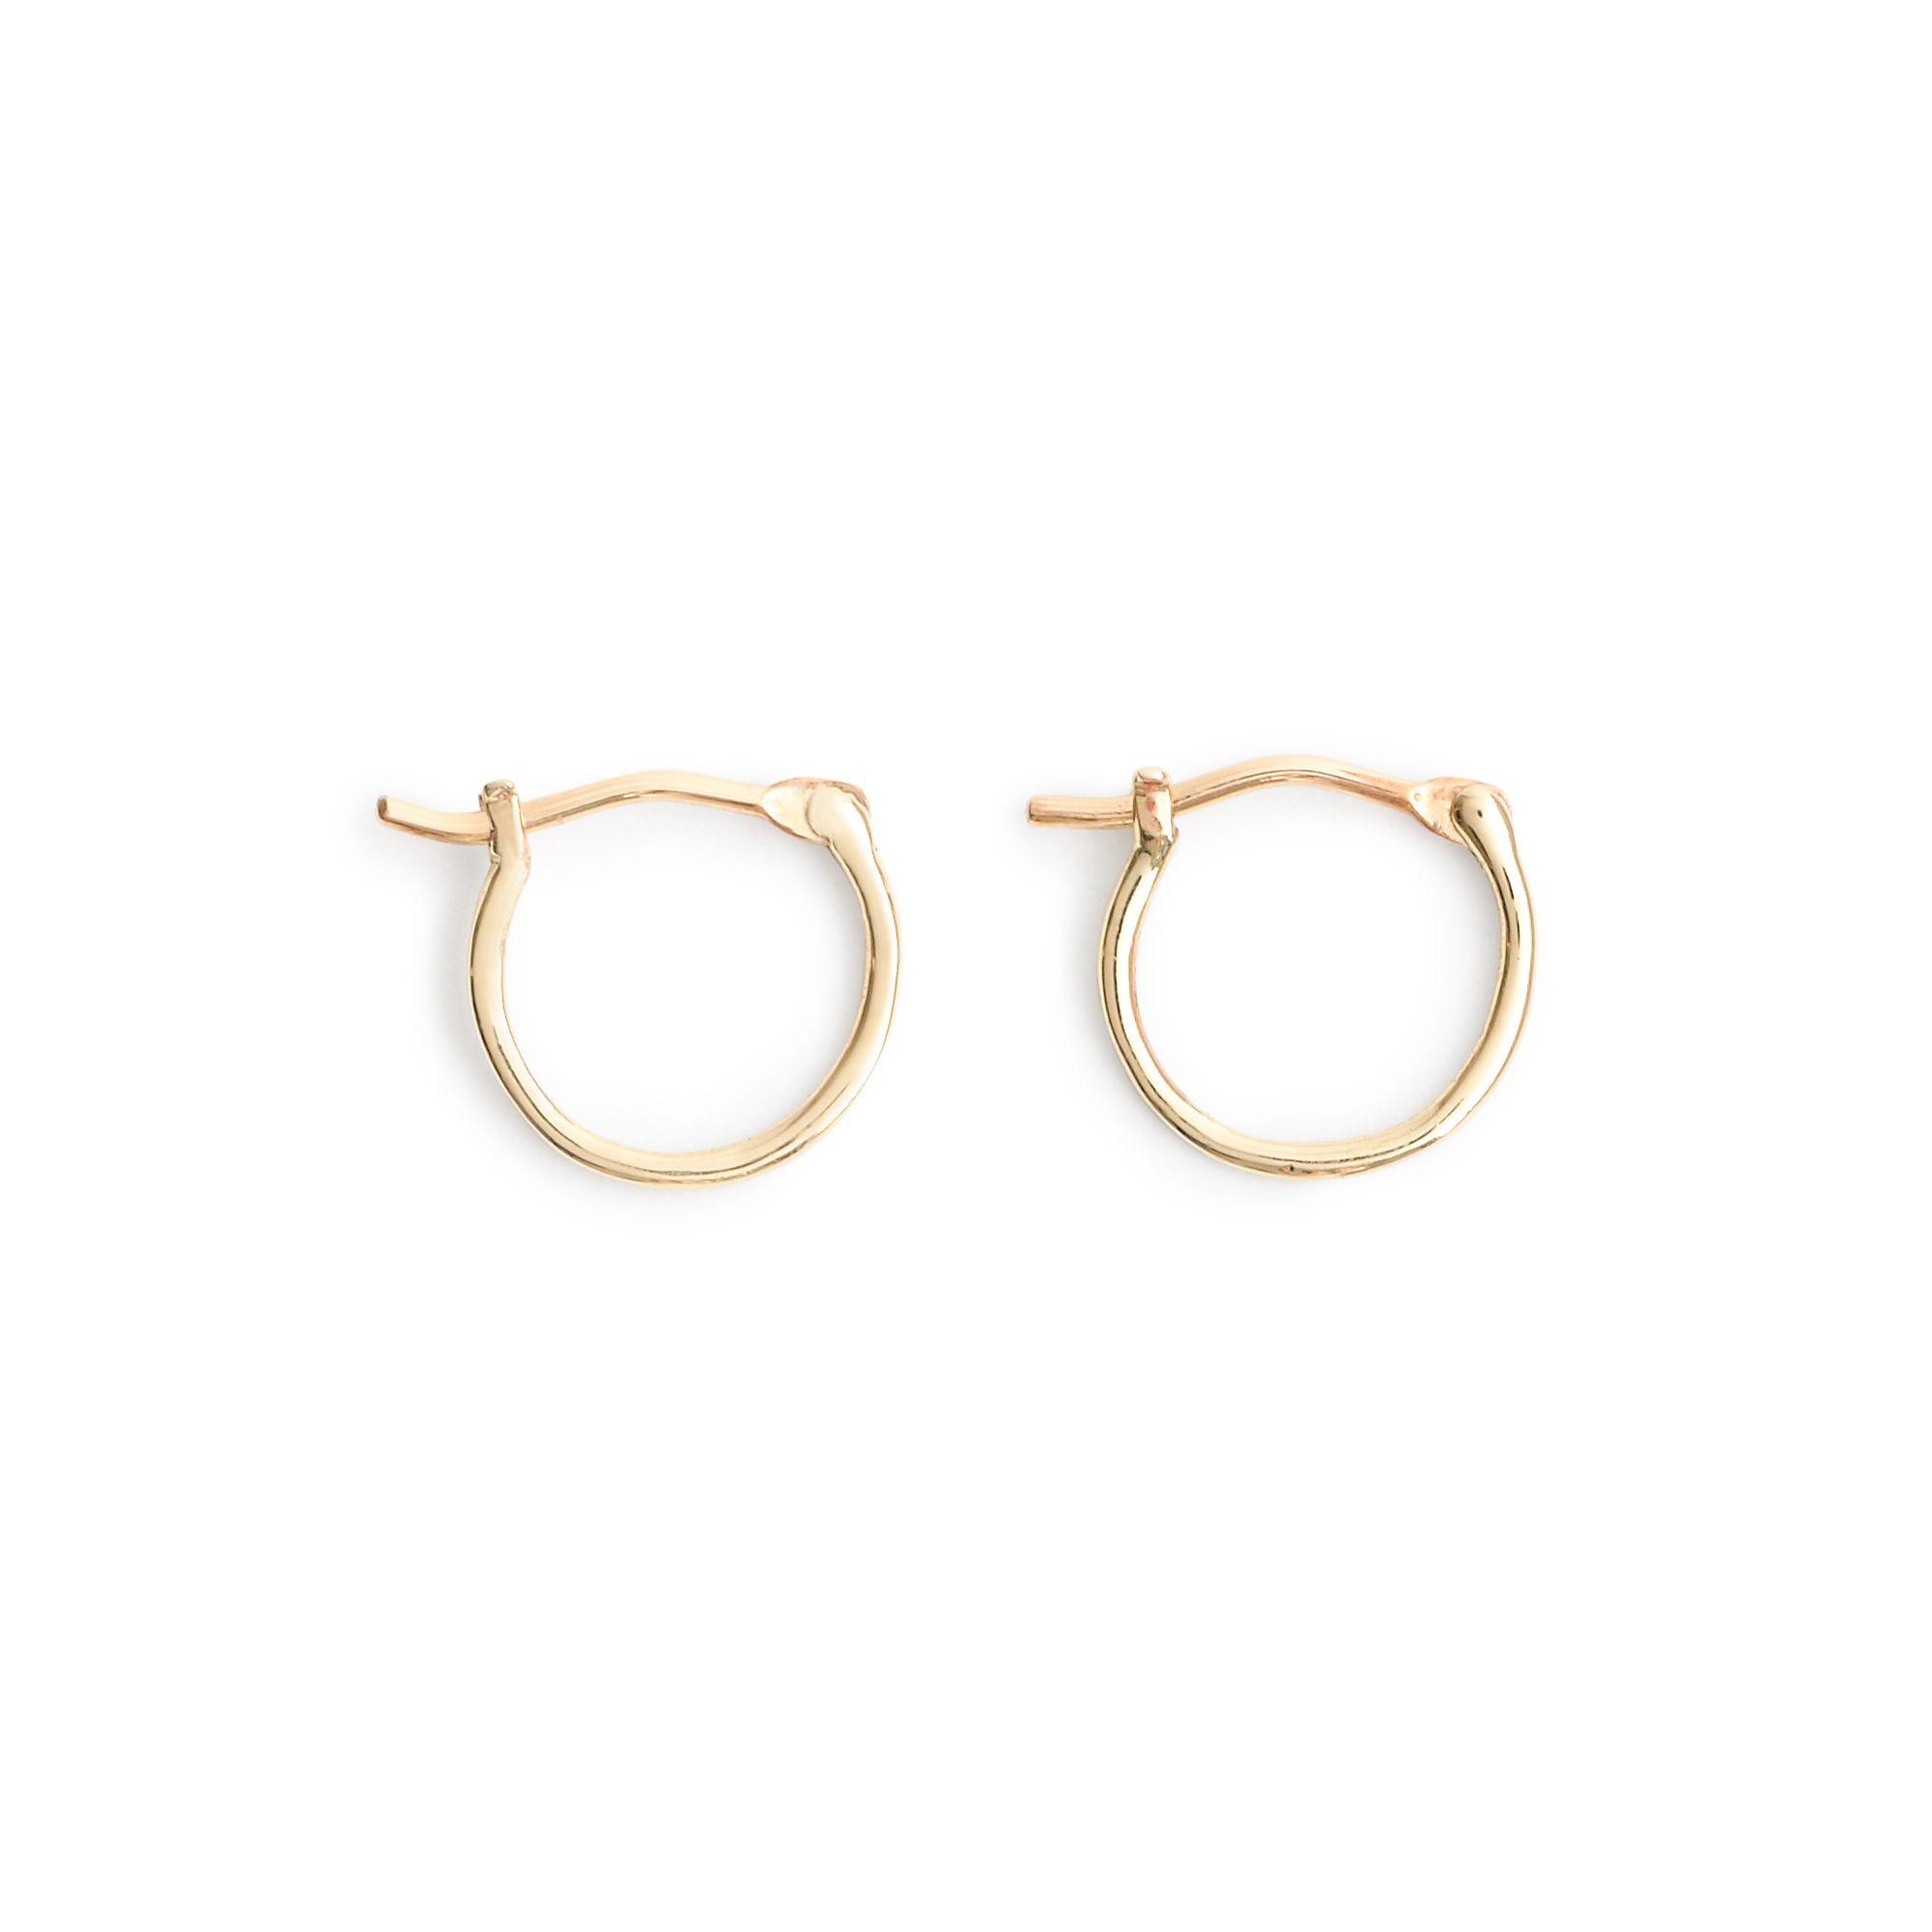 J.crew 14k Gold Small Hoop Earrings in Gold